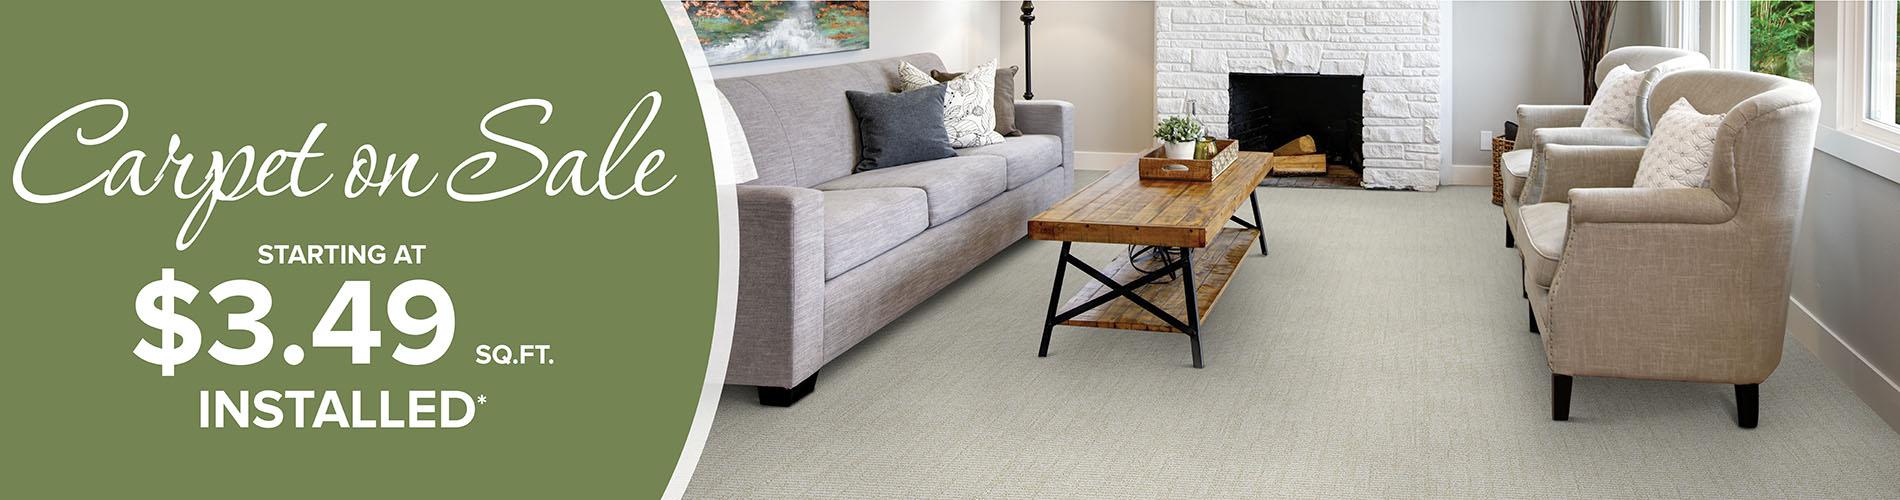 Carpet on sale starting at $3.49 sq. ft. installed